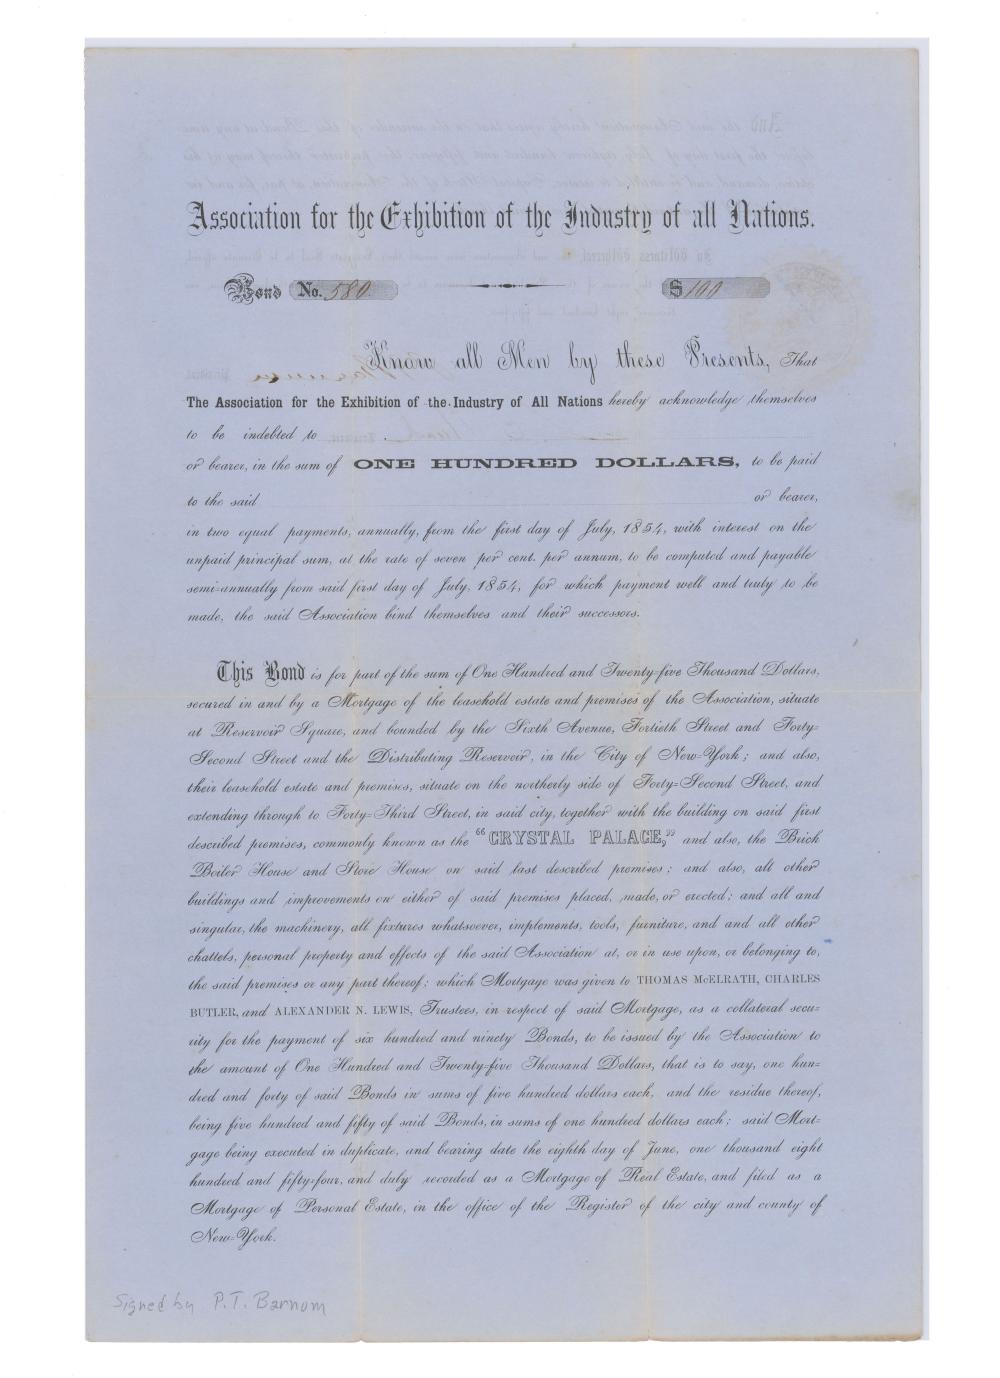 P.T. Barnum Signed Fantastic Crystal Palace Bond